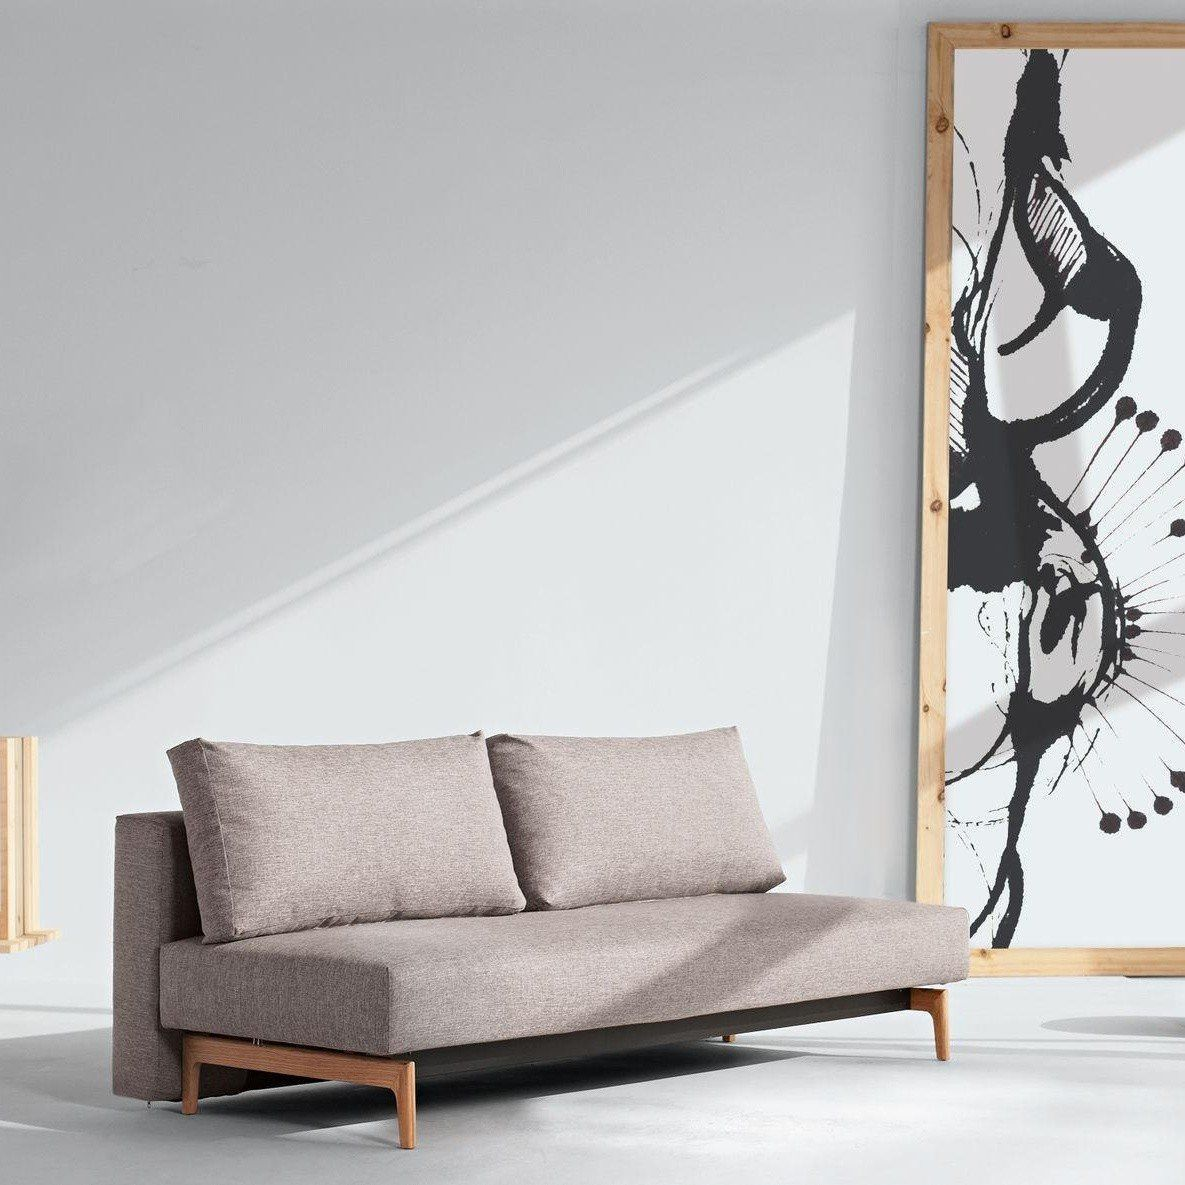 innovation trym schlafsofa ambientedirect. Black Bedroom Furniture Sets. Home Design Ideas